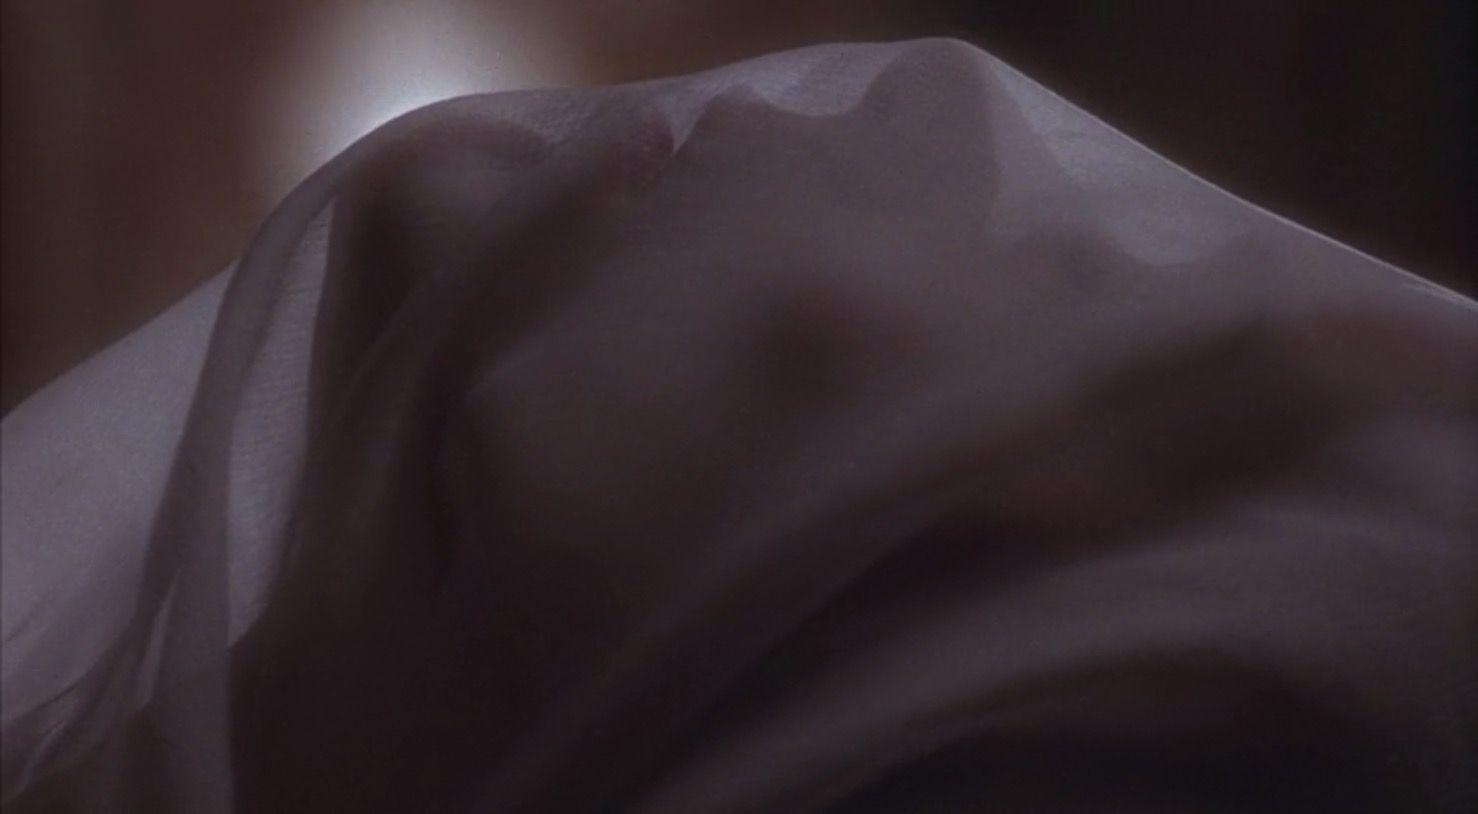 lesbian porn netflix free fat pics